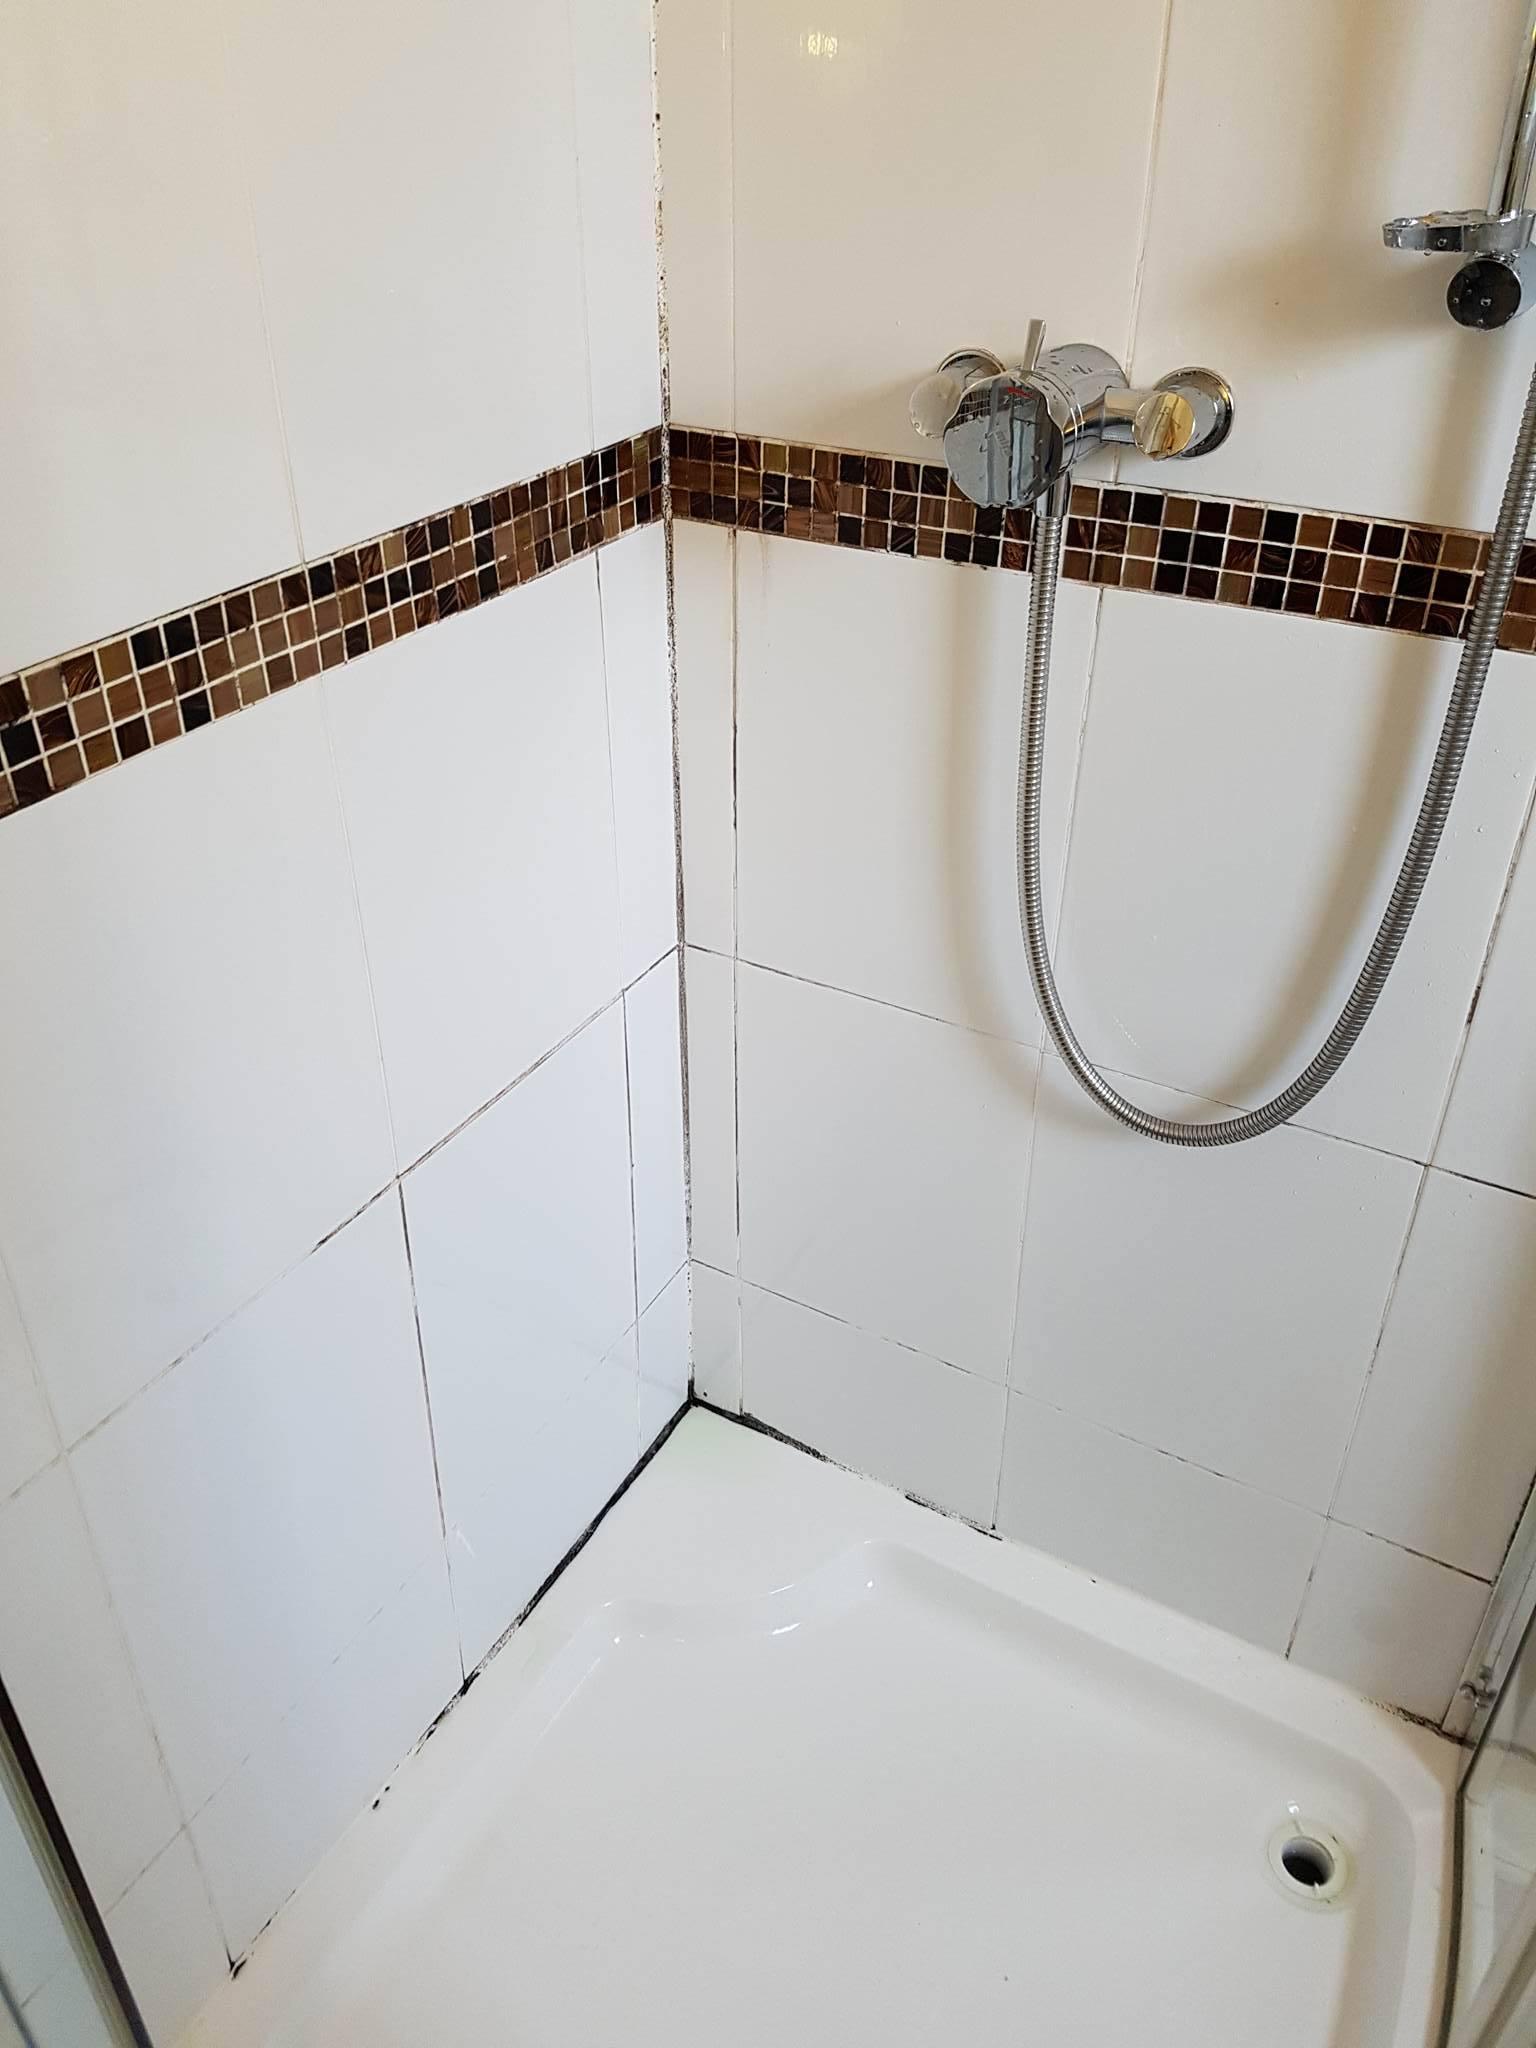 Ceramic Tiled Shower Cubicle Before Restoration Moston